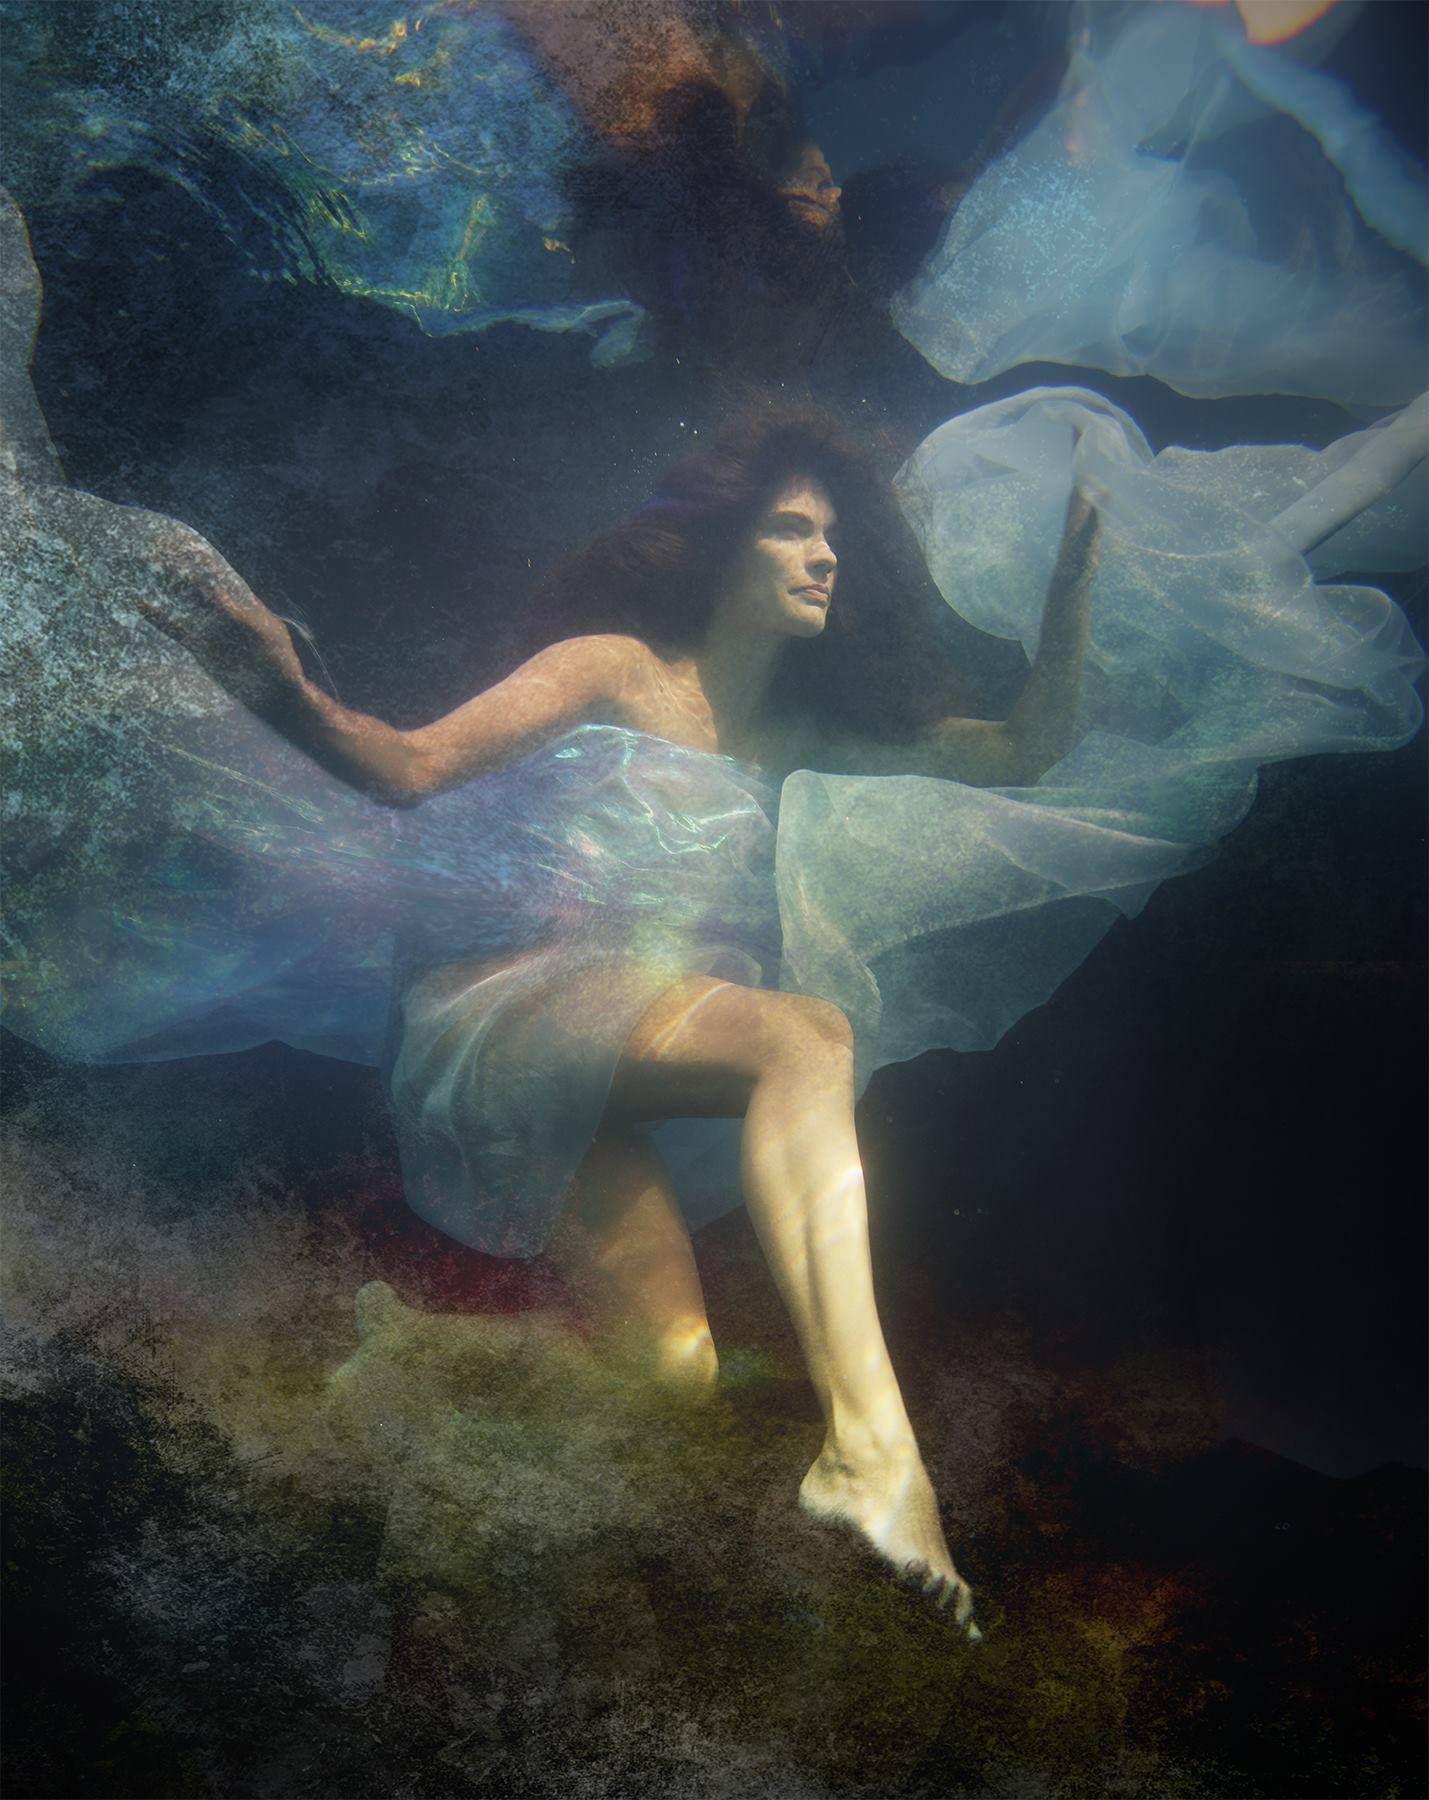 Ethereal Underwater Photographs Capture Frozen Moments in